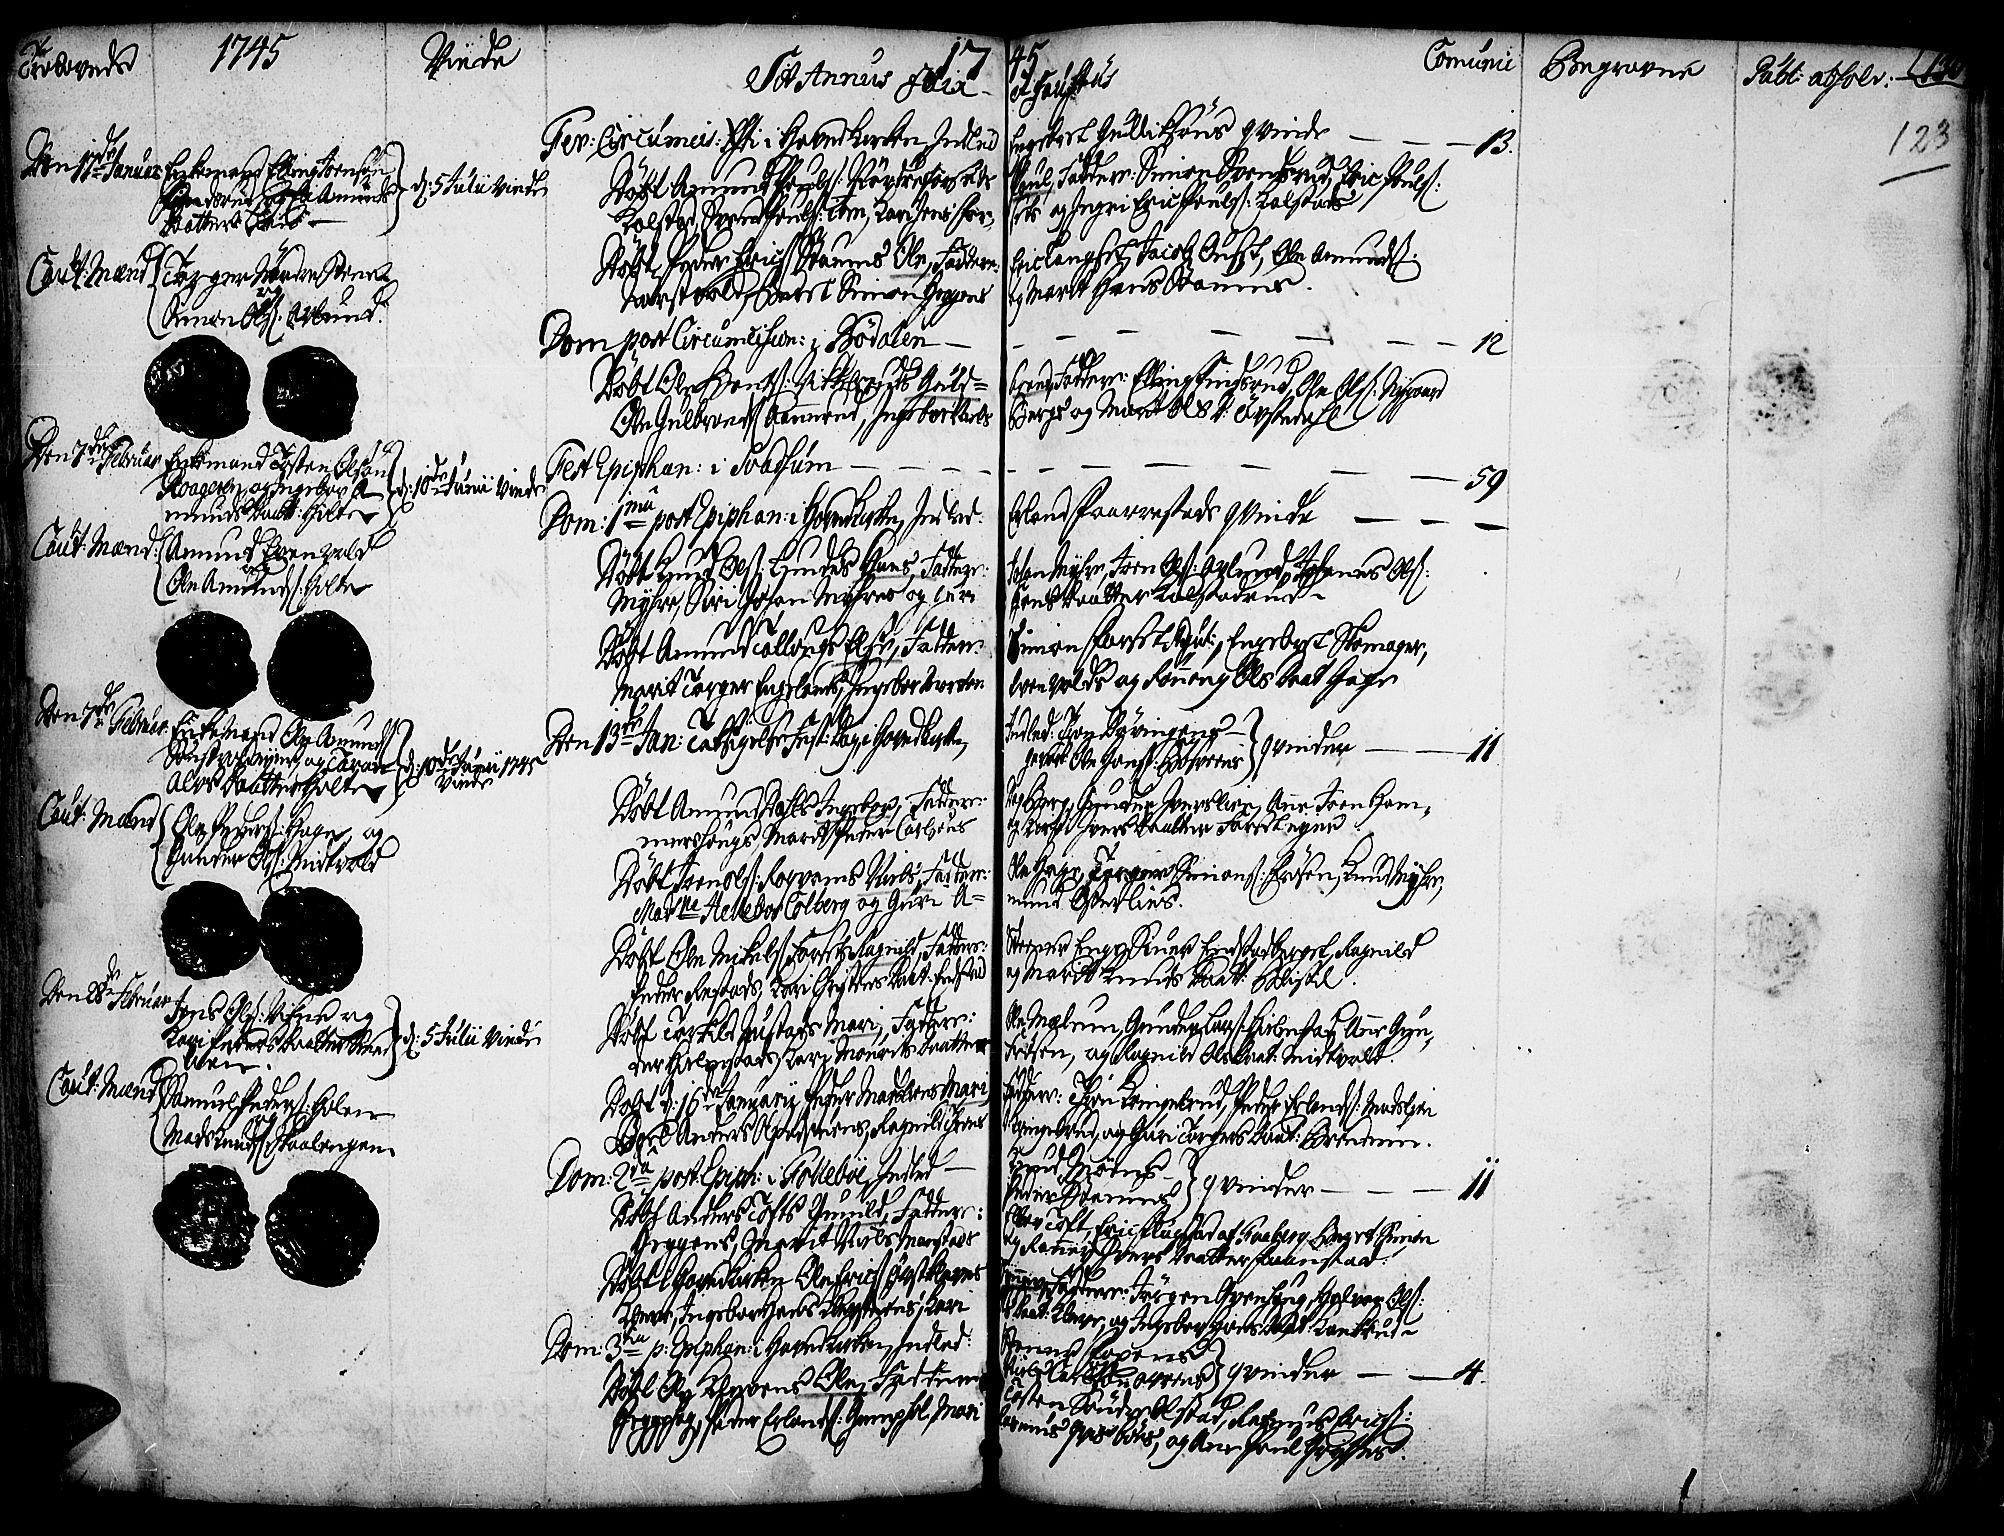 SAH, Gausdal prestekontor, Ministerialbok nr. 2, 1729-1757, s. 123